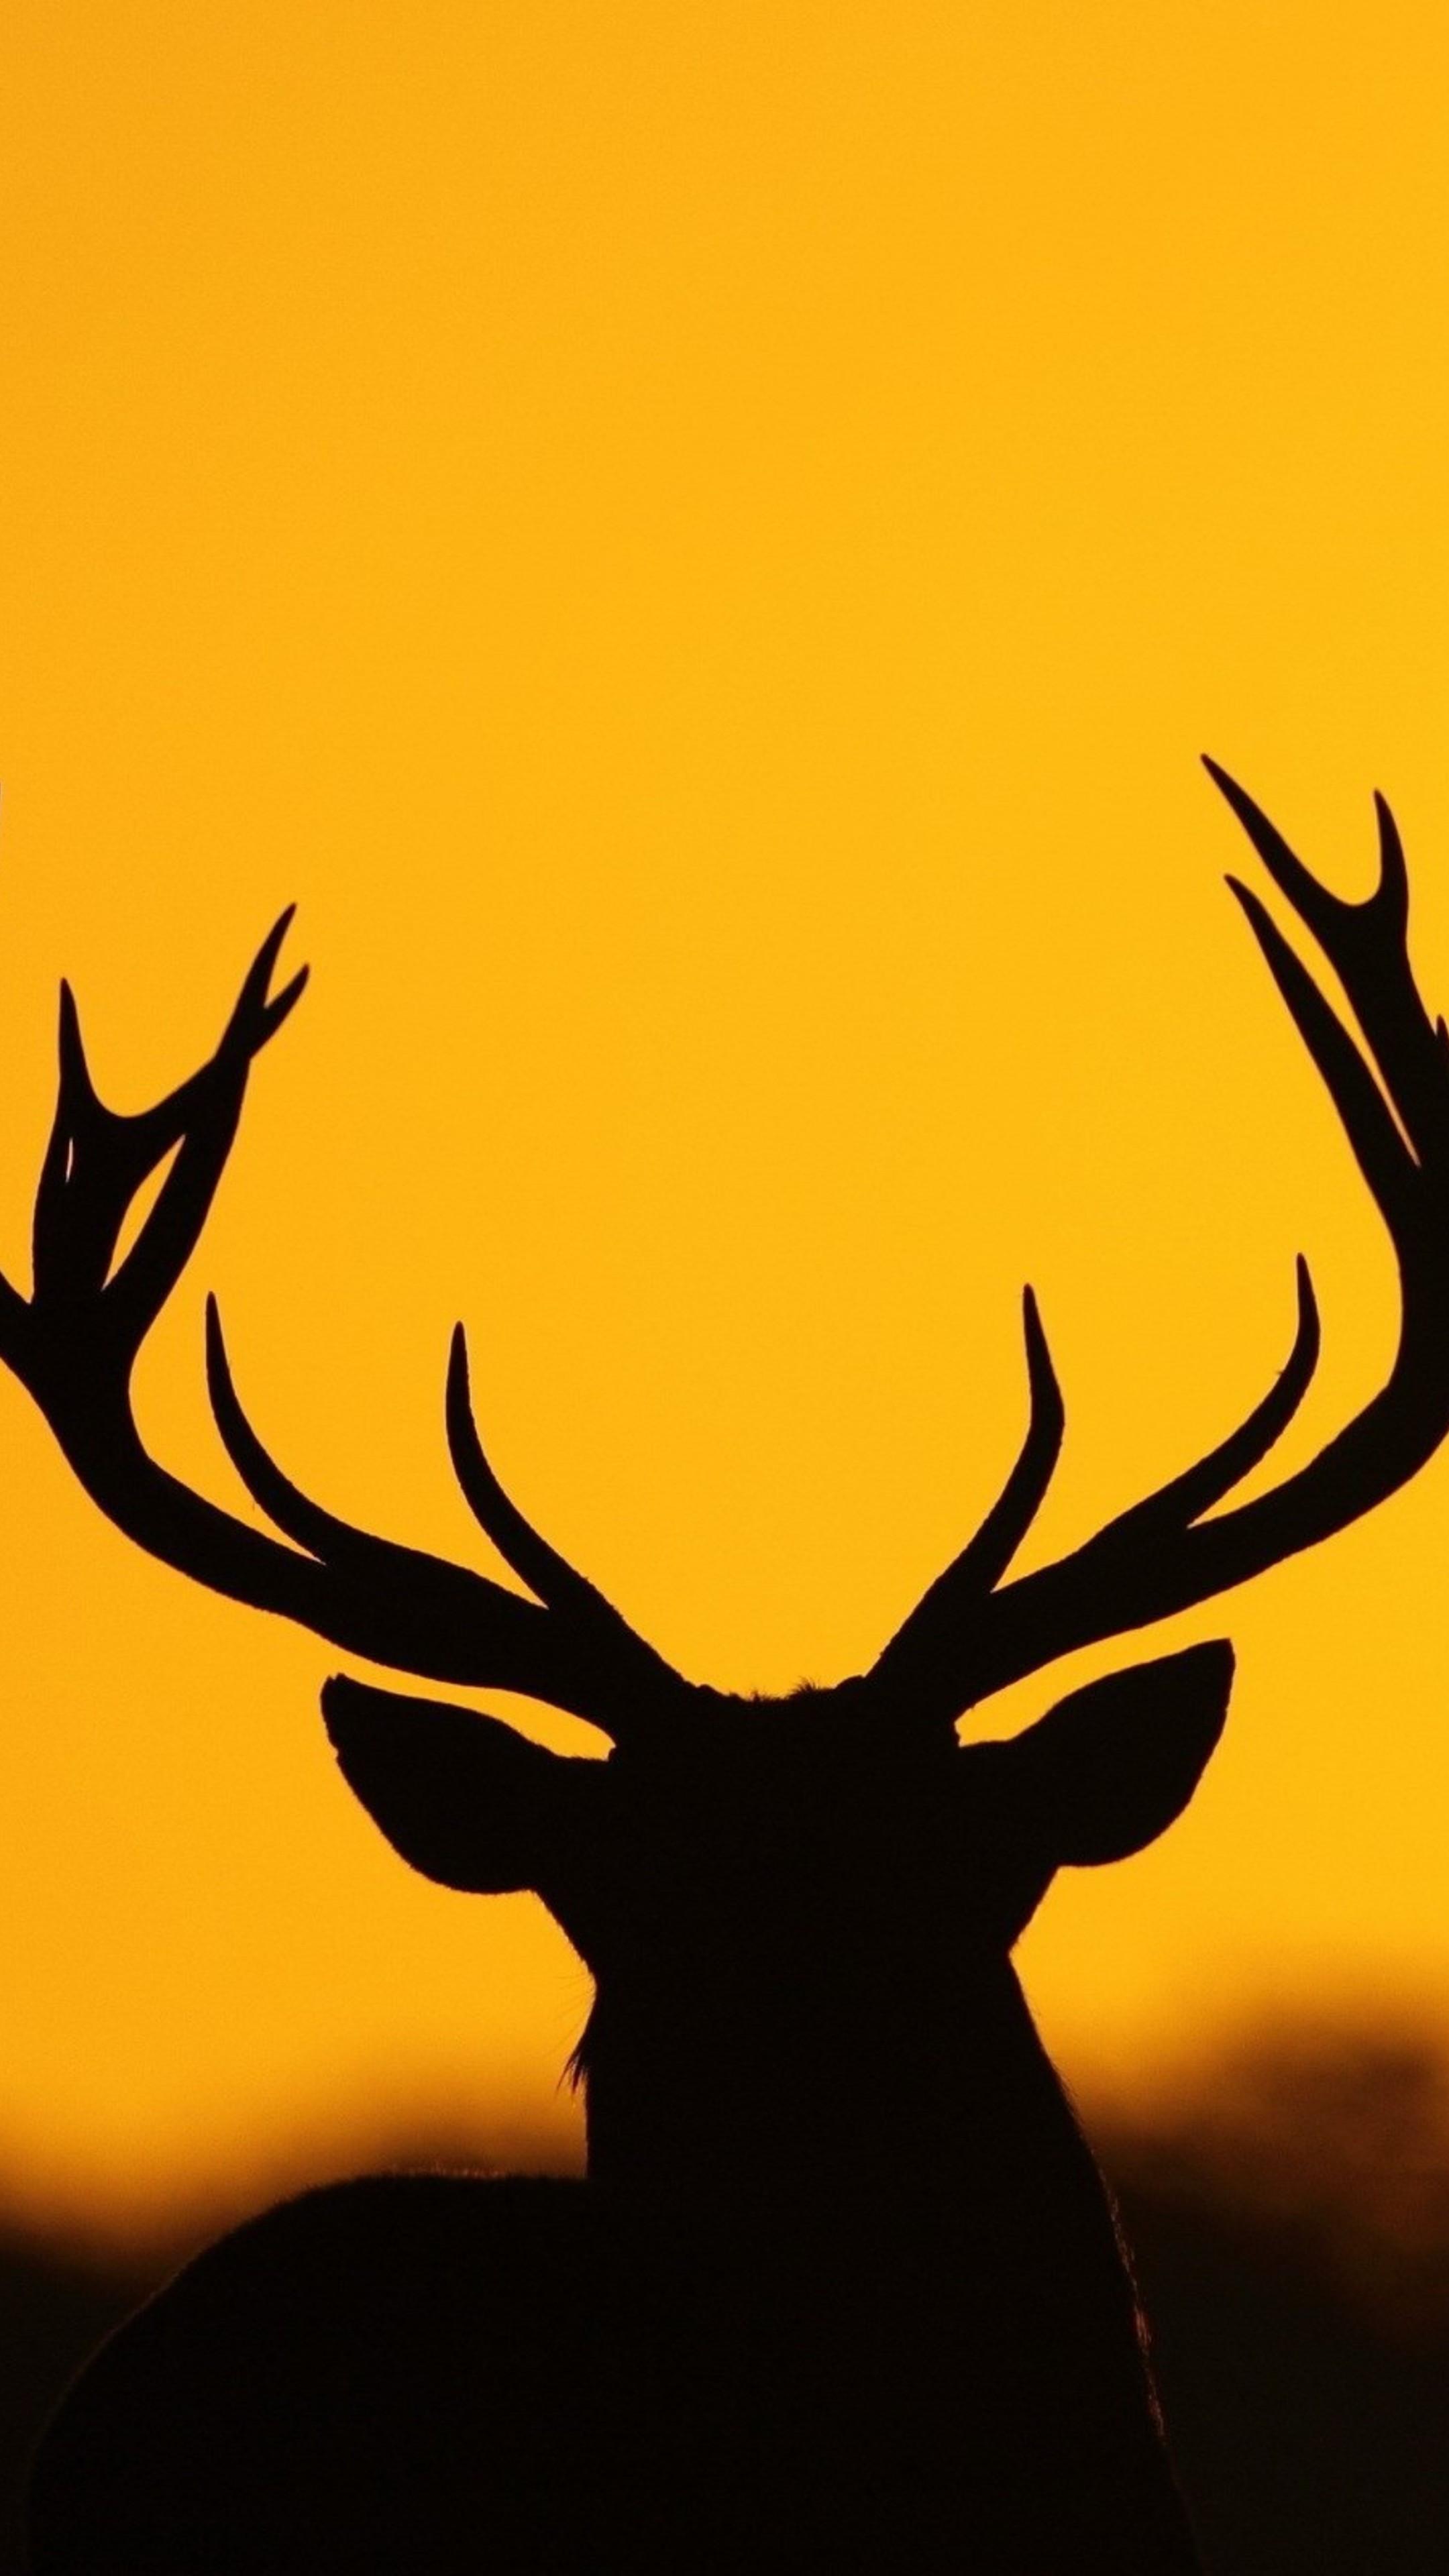 2160x3840 Black Silhouette Of Deer Antlers Stock Vector Art More Images